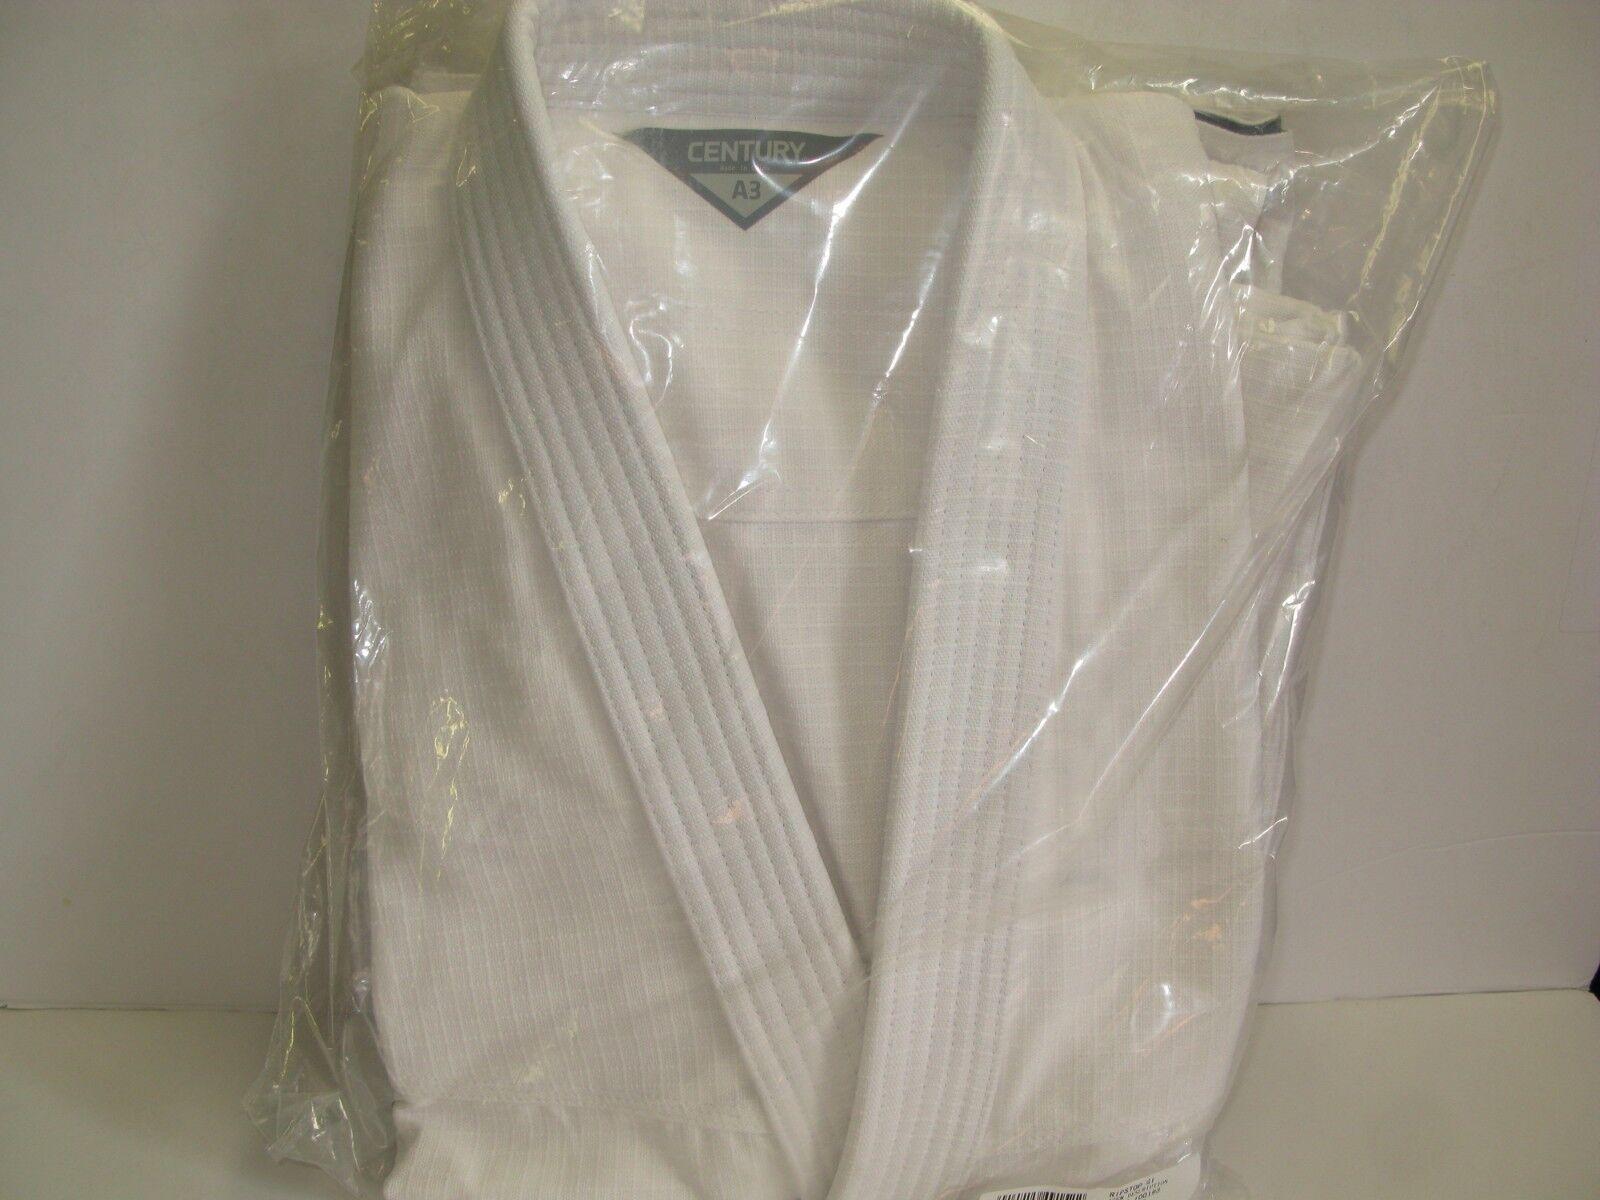 New Century Adult RIPSTOP Brazilian Jiu-Jitsu Gi Uniform White A13